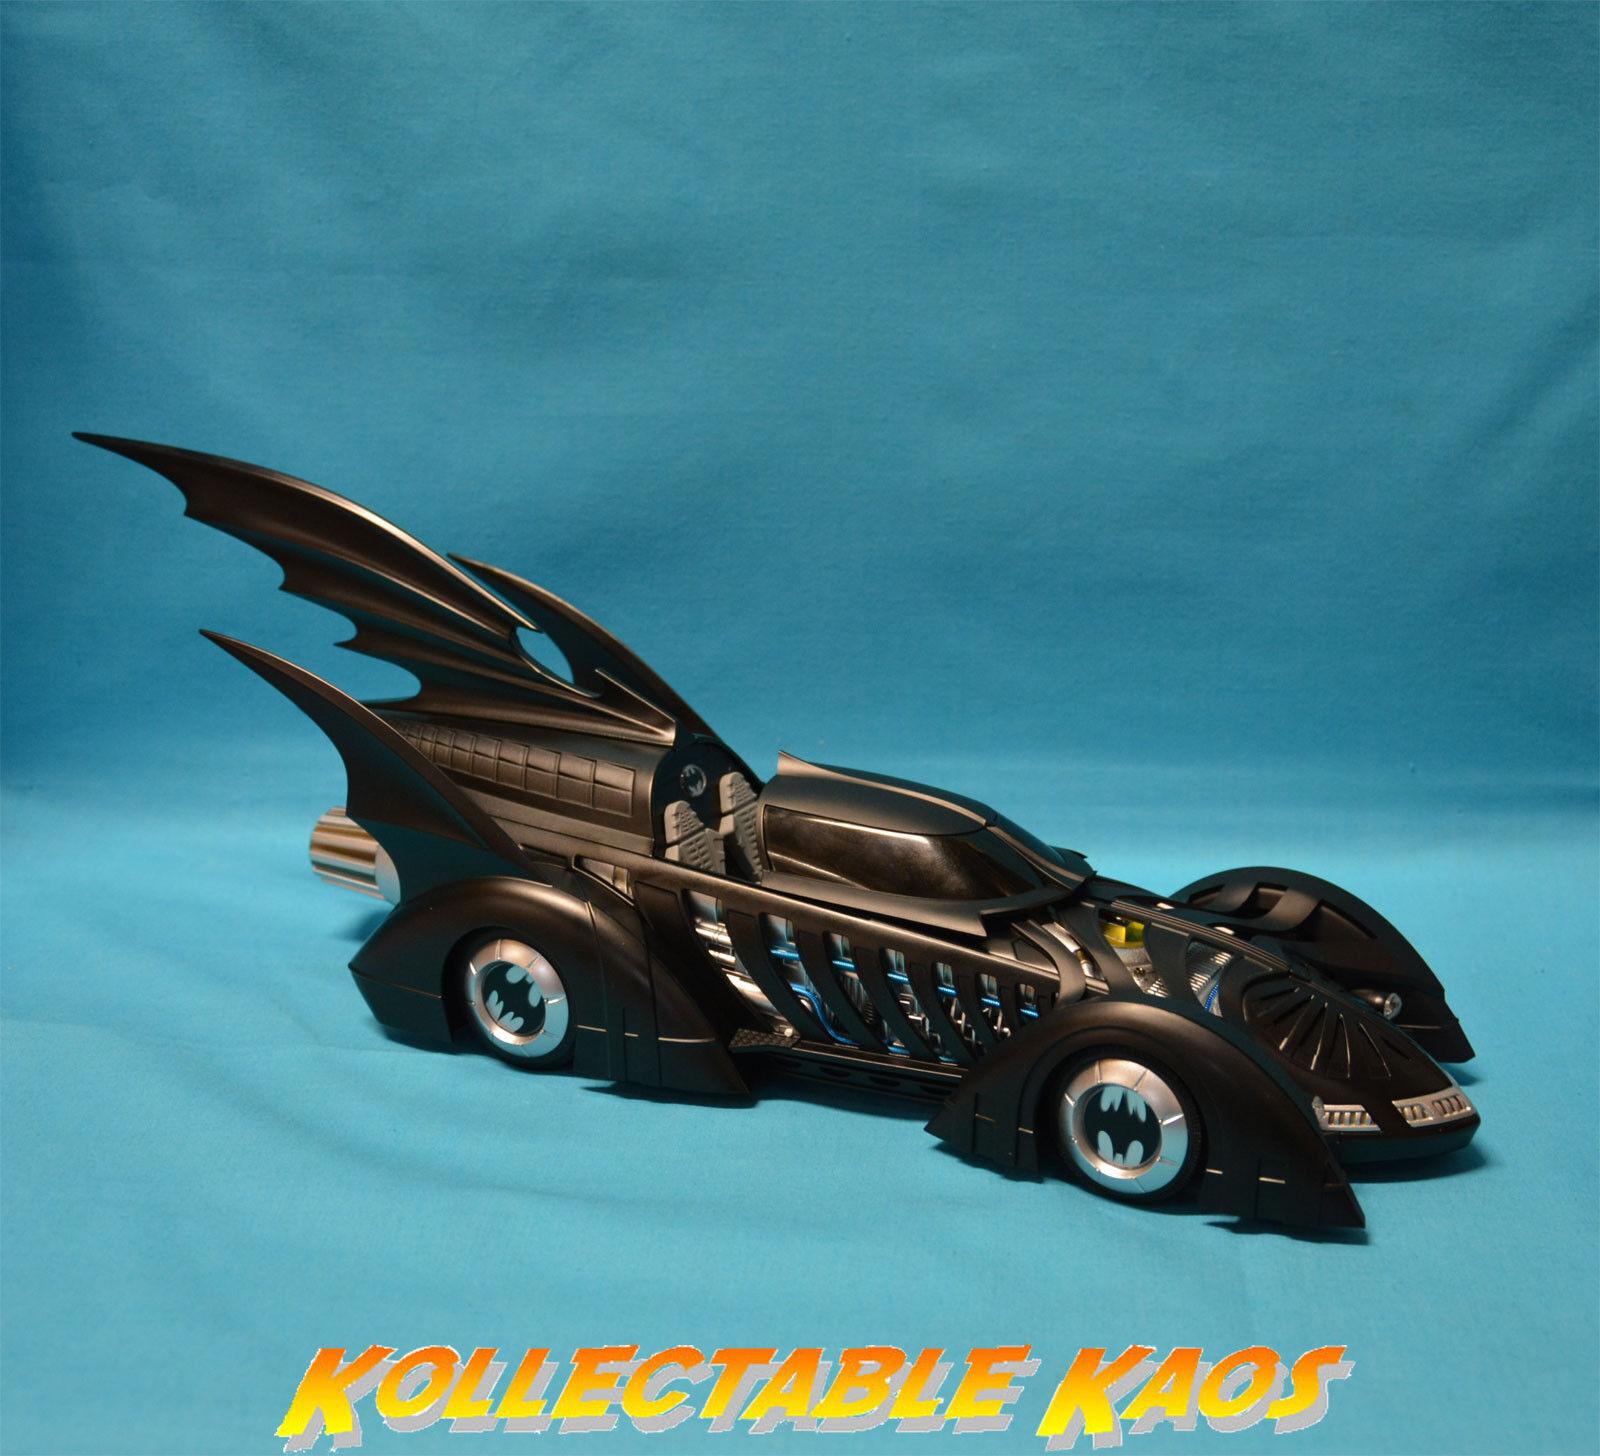 Batman - 1 18 Elite Cult 1995 Batmobile - Batman Forever